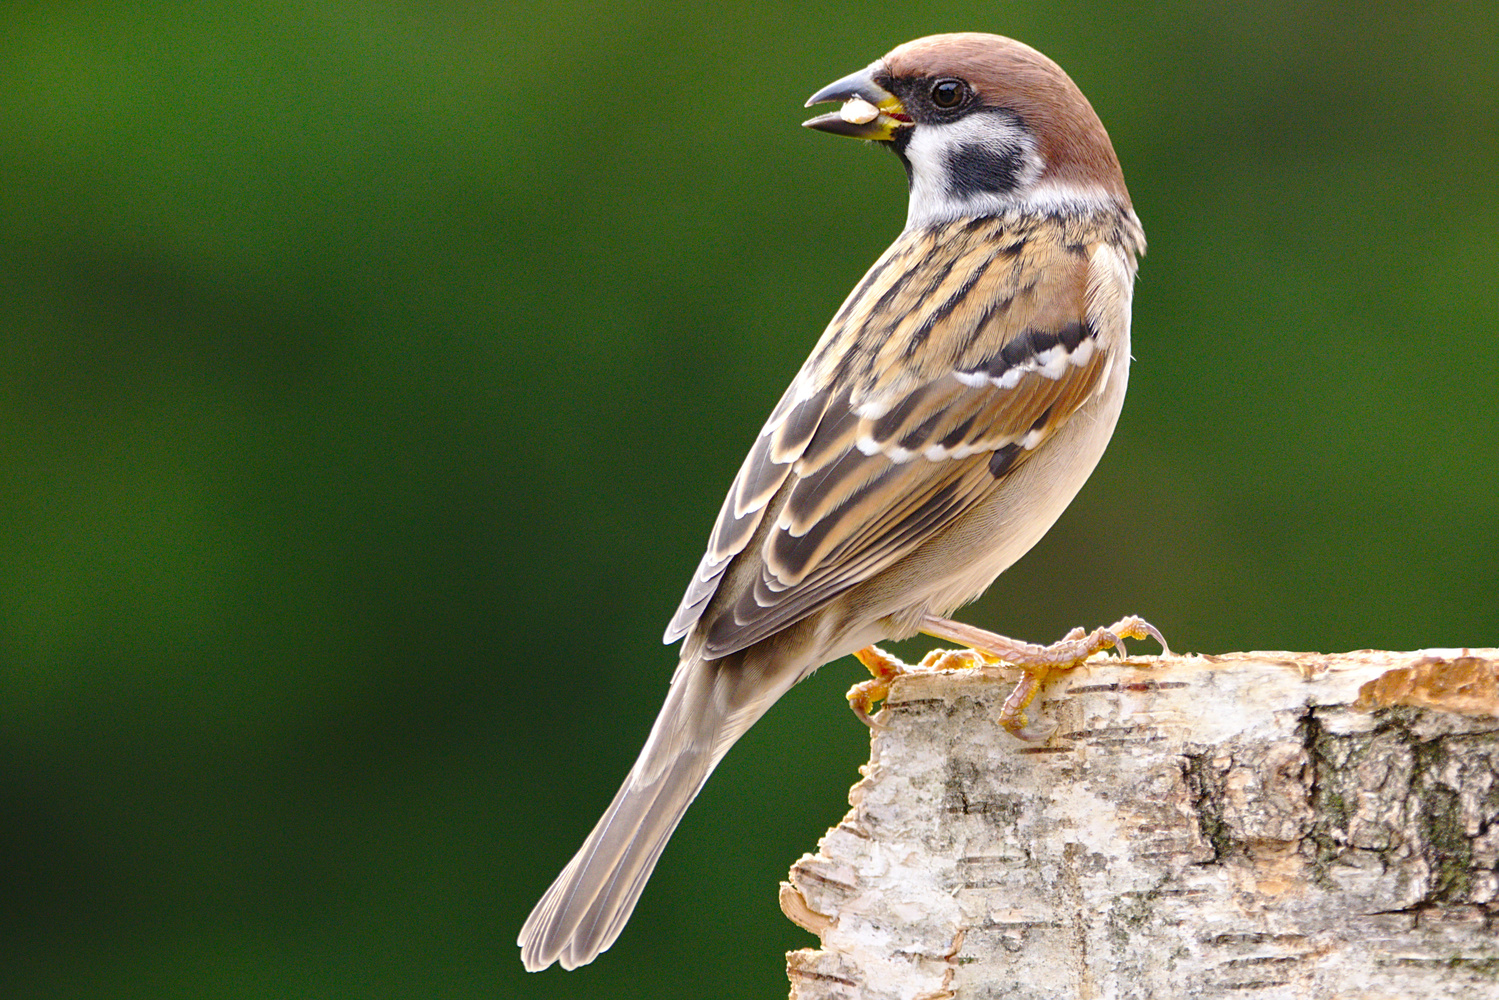 Eurasian tree sparrow (Passer montanus) by Lukasz J